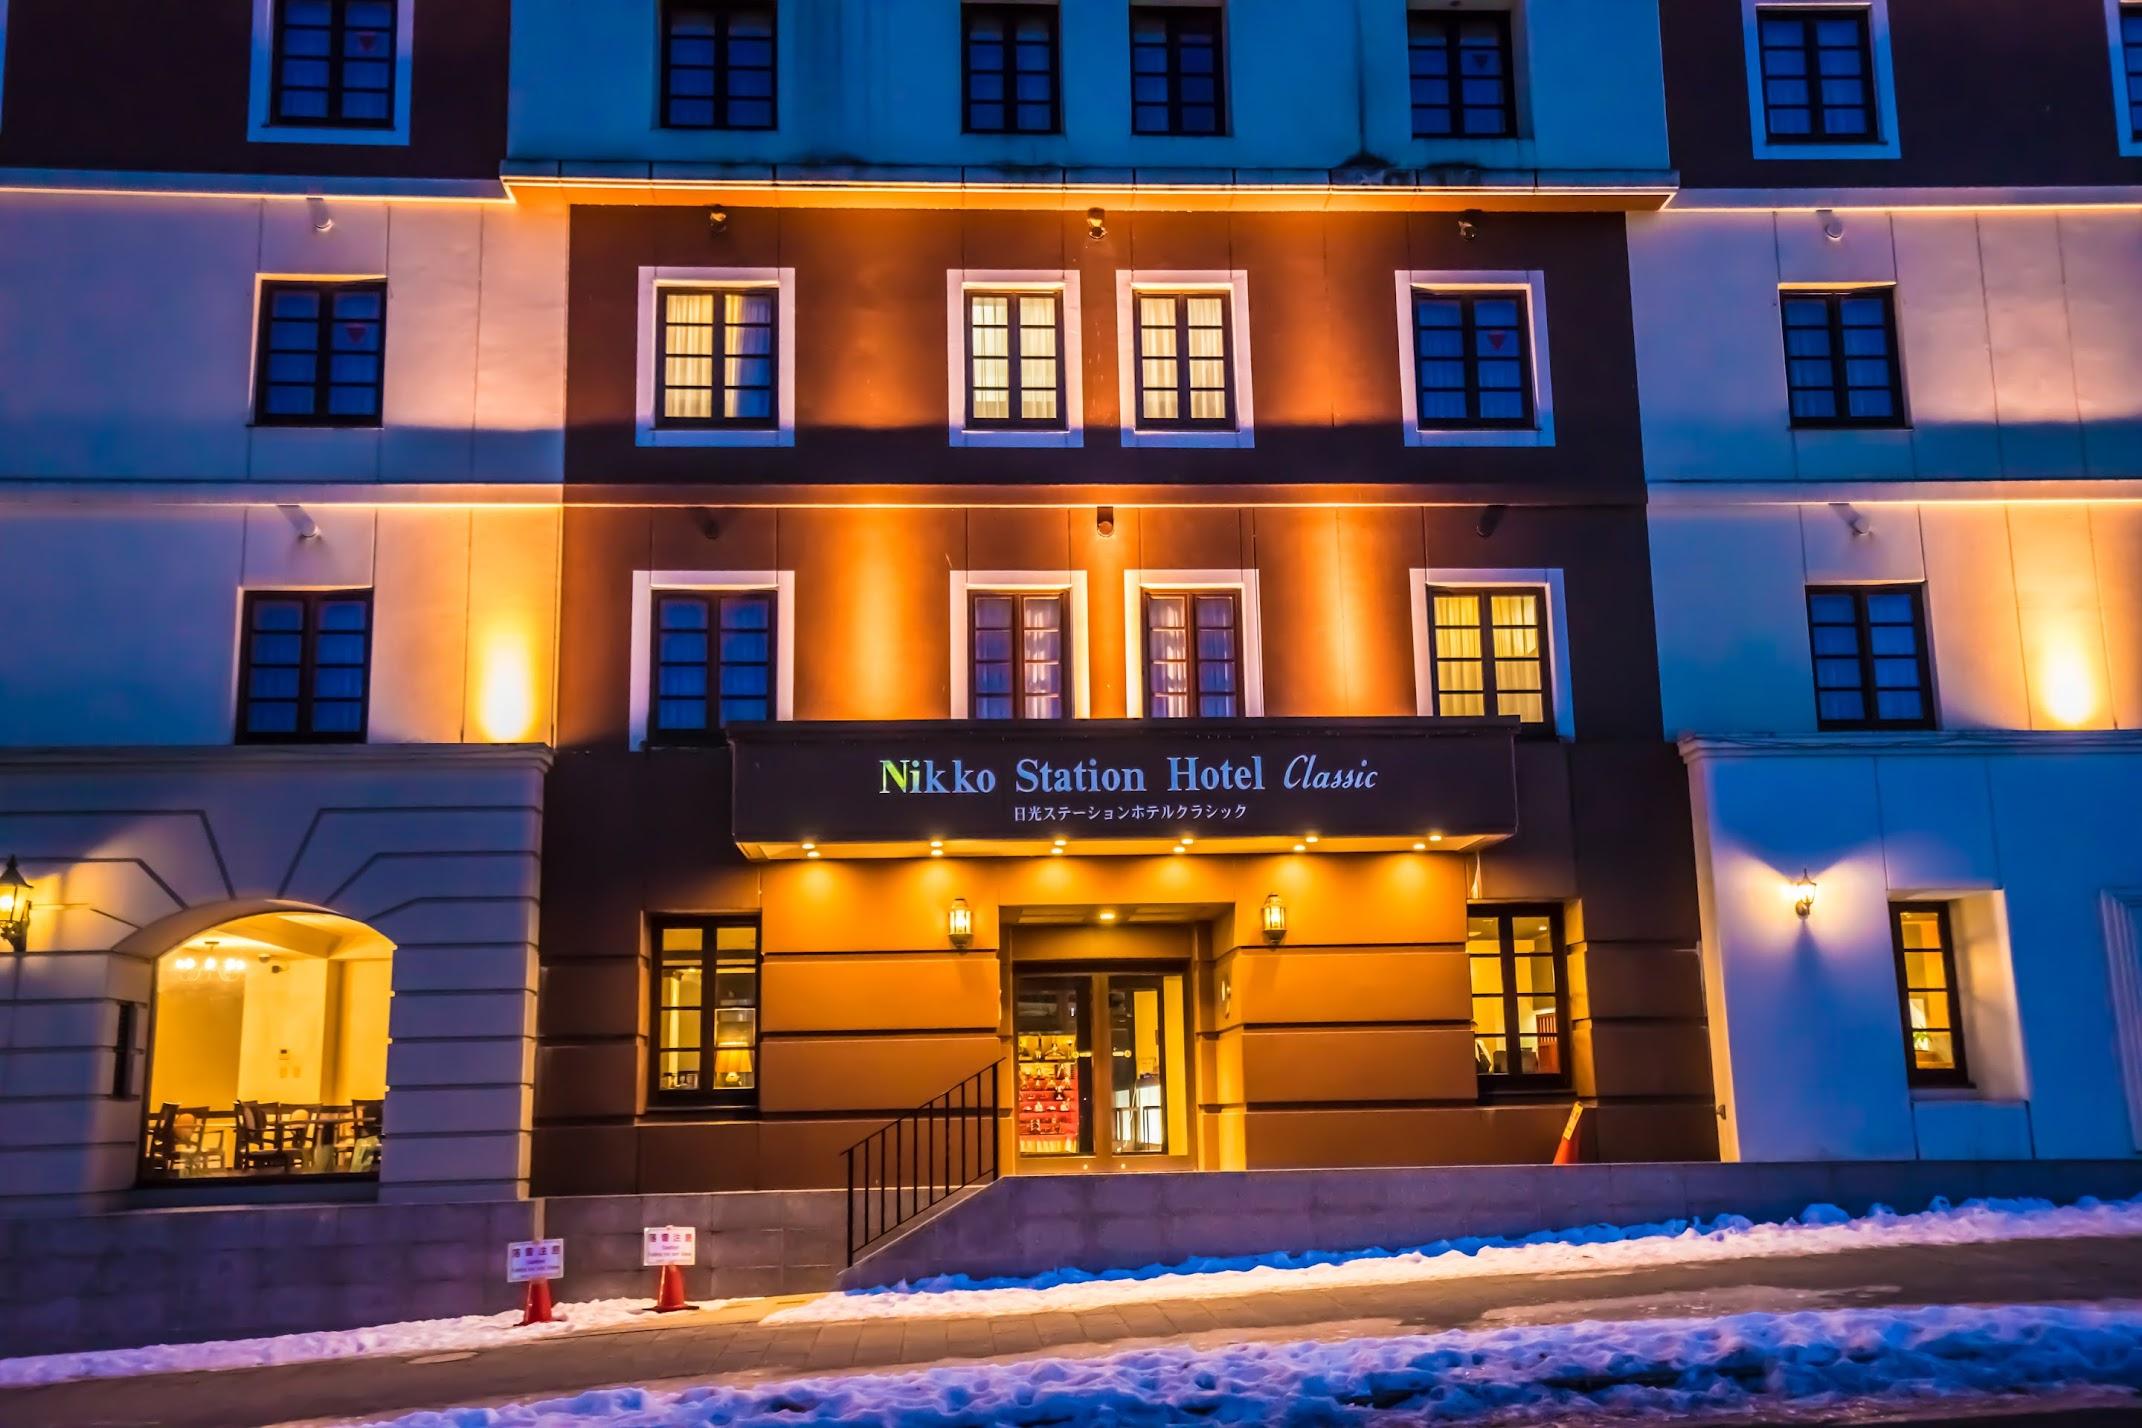 Nikko Station Hotel Classic2